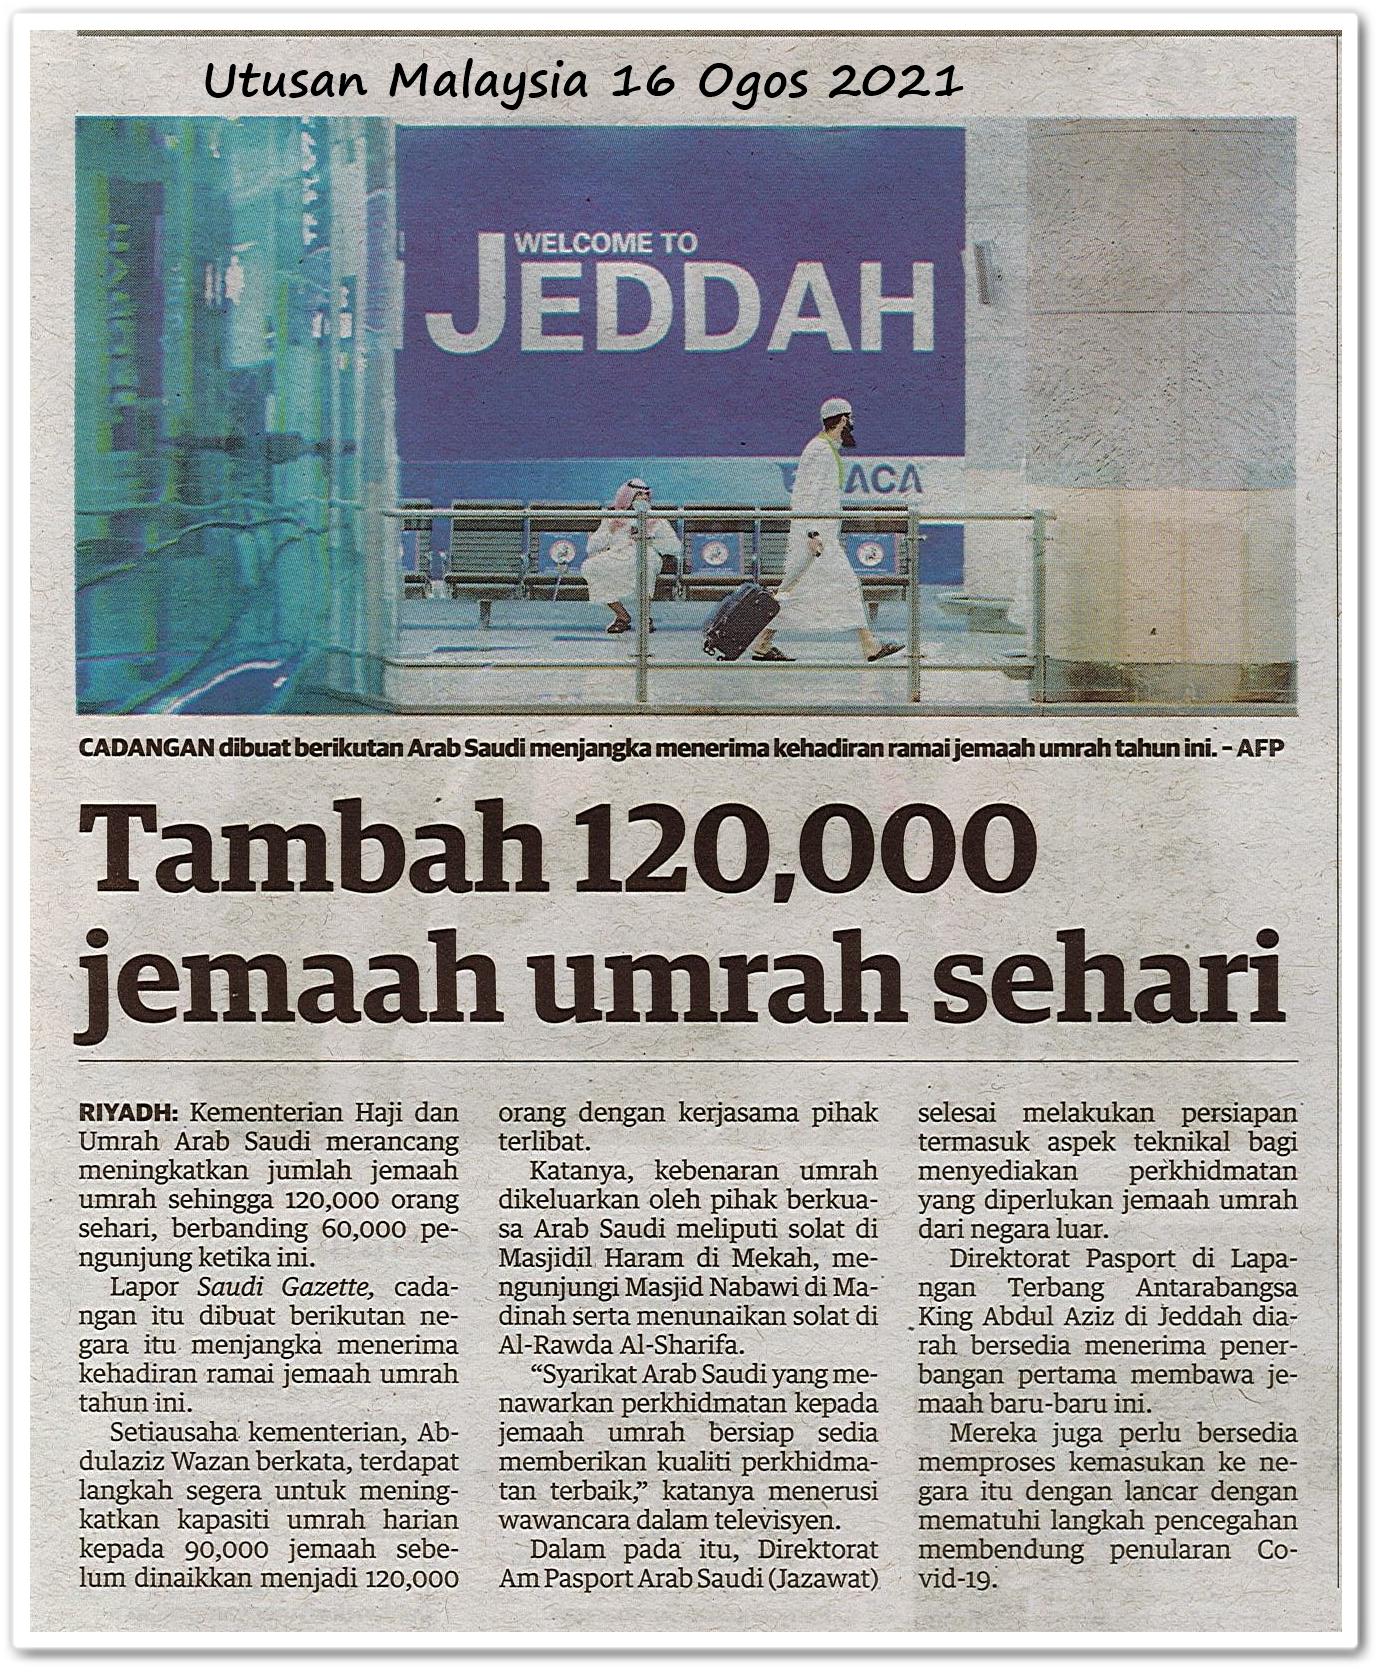 Tambah 120,000 jemaah umrah sehari - Keratan akhbar Utusan Malaysia 16 Ogos 2021